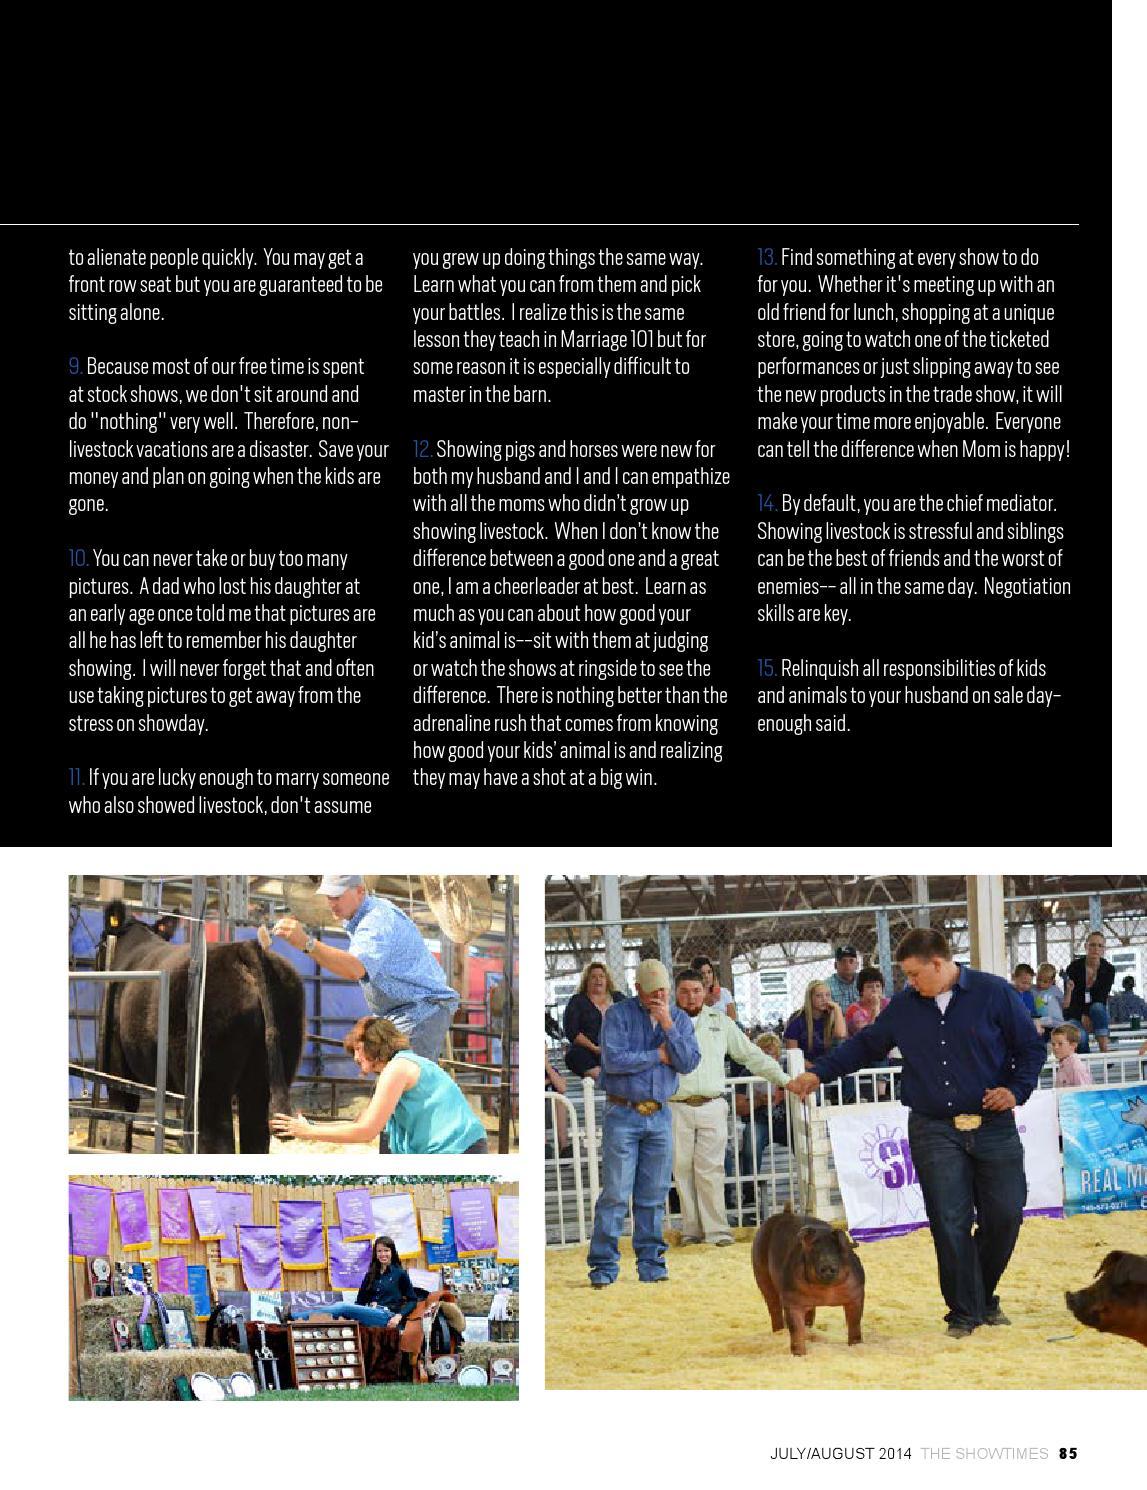 July/August 2014 State Fair Edition by Brian Reid - issuu